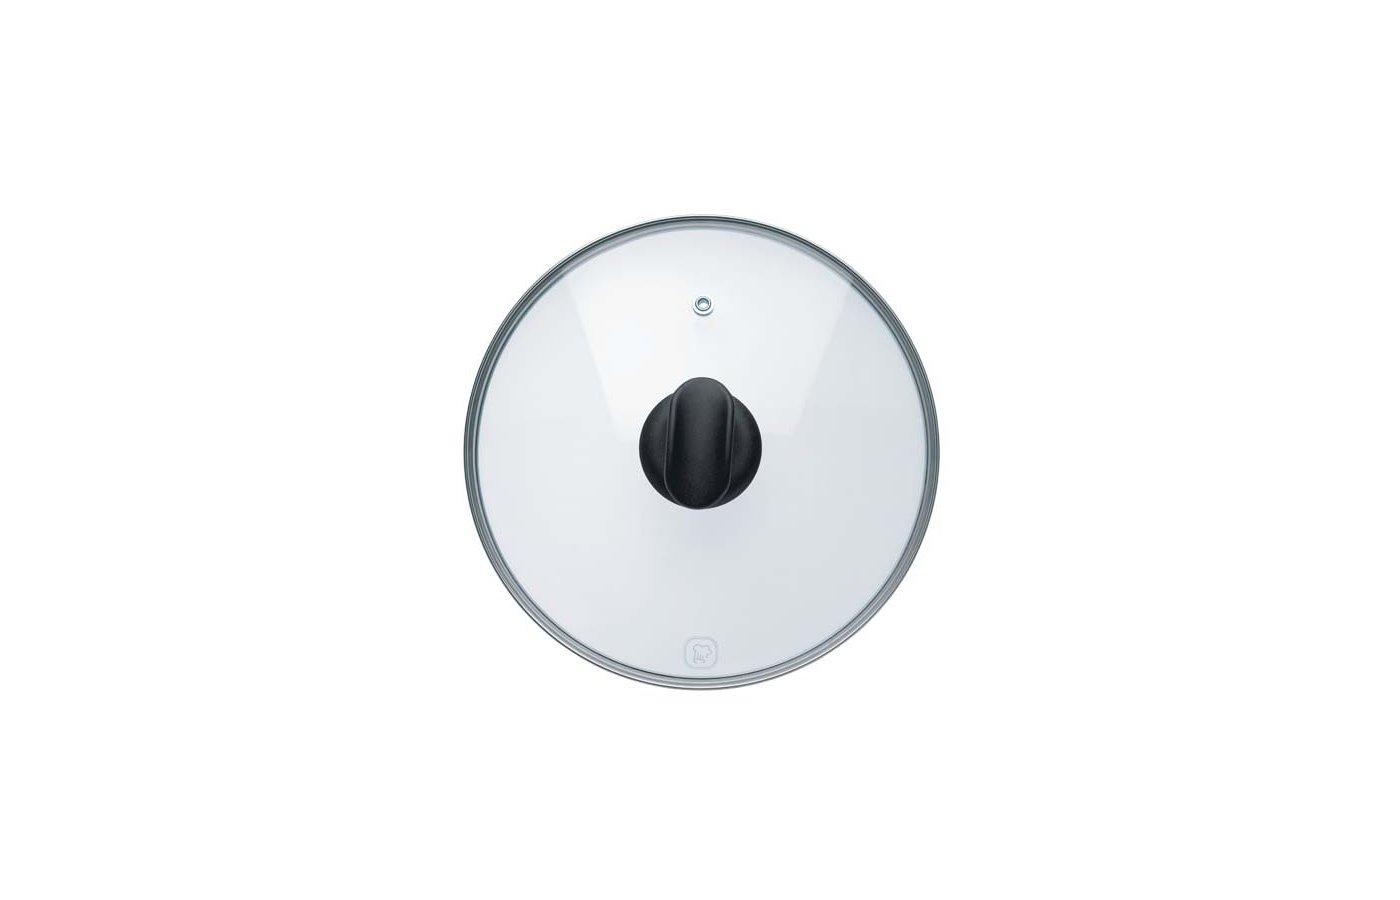 крышка до 20 см Rondell RDA-125 20см (0)301013 Крышка